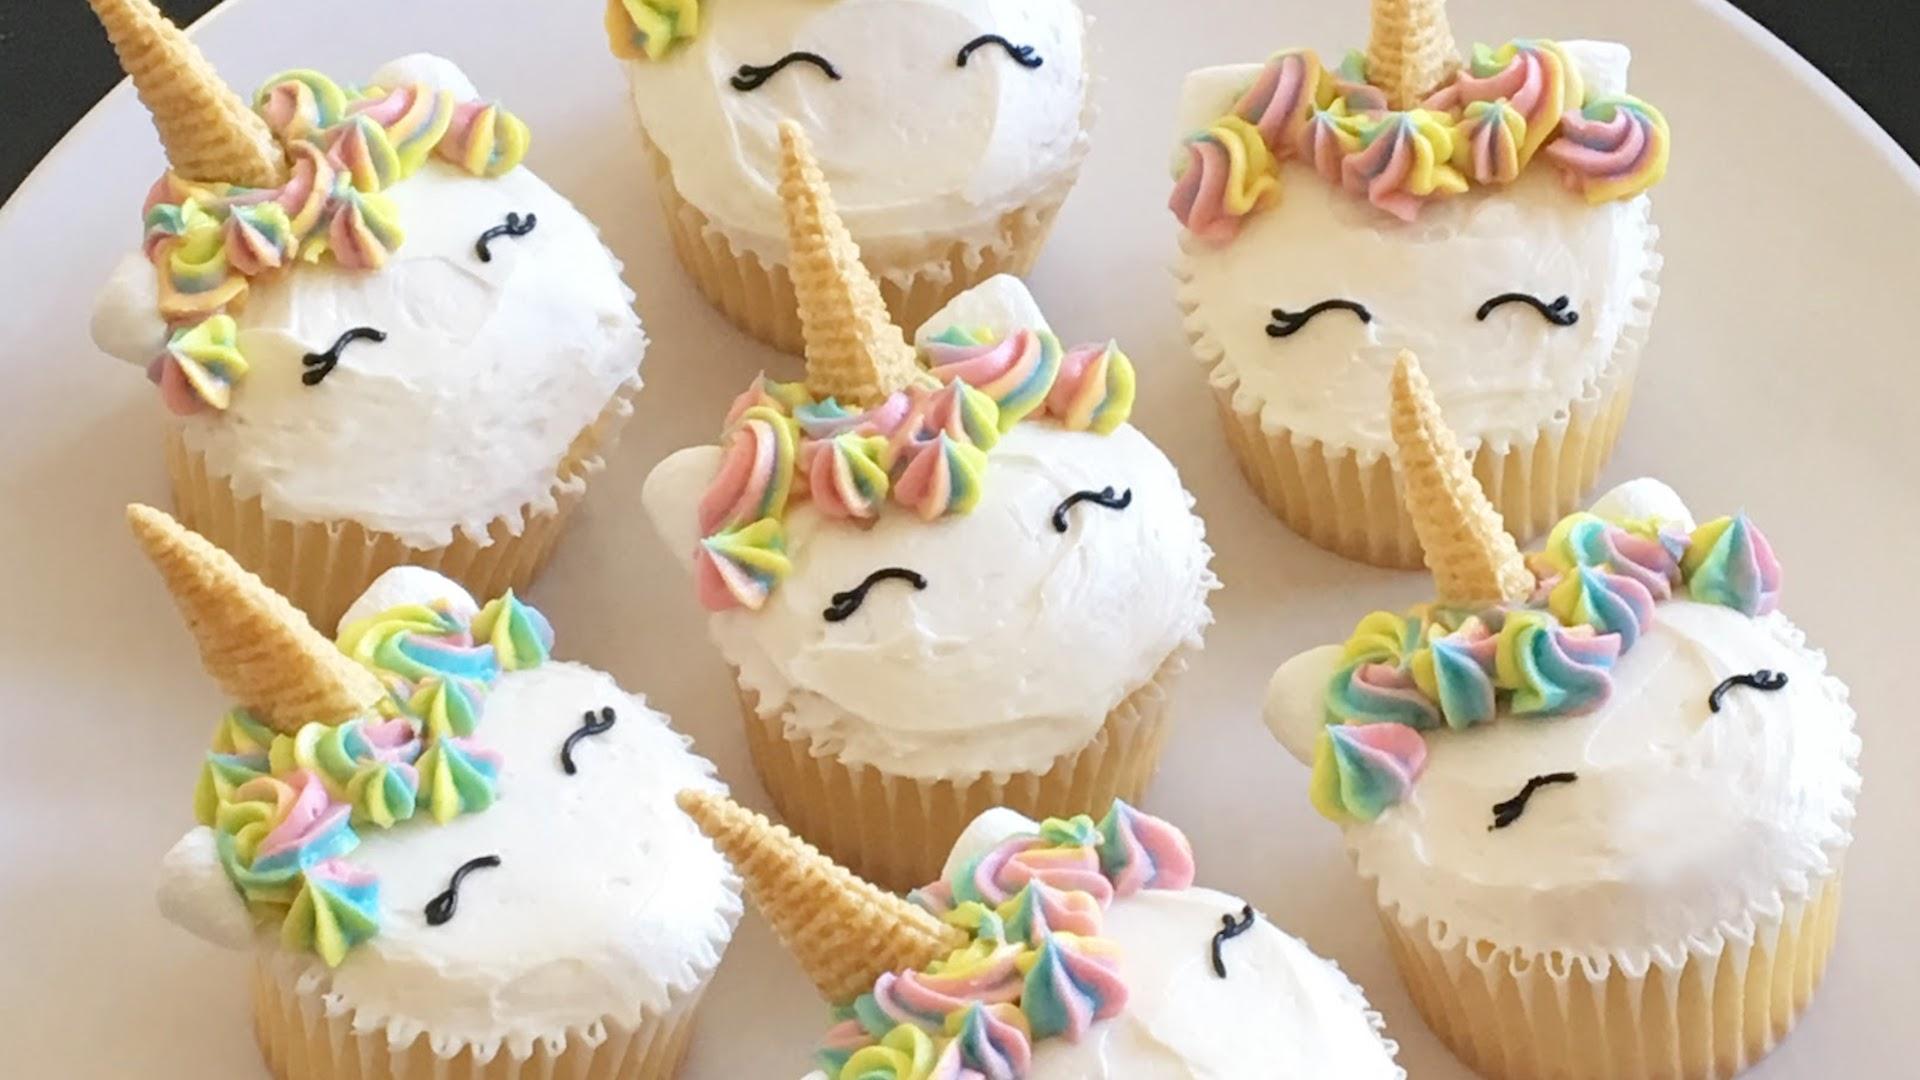 Unicorn Cupcakes Today 041918 Tease